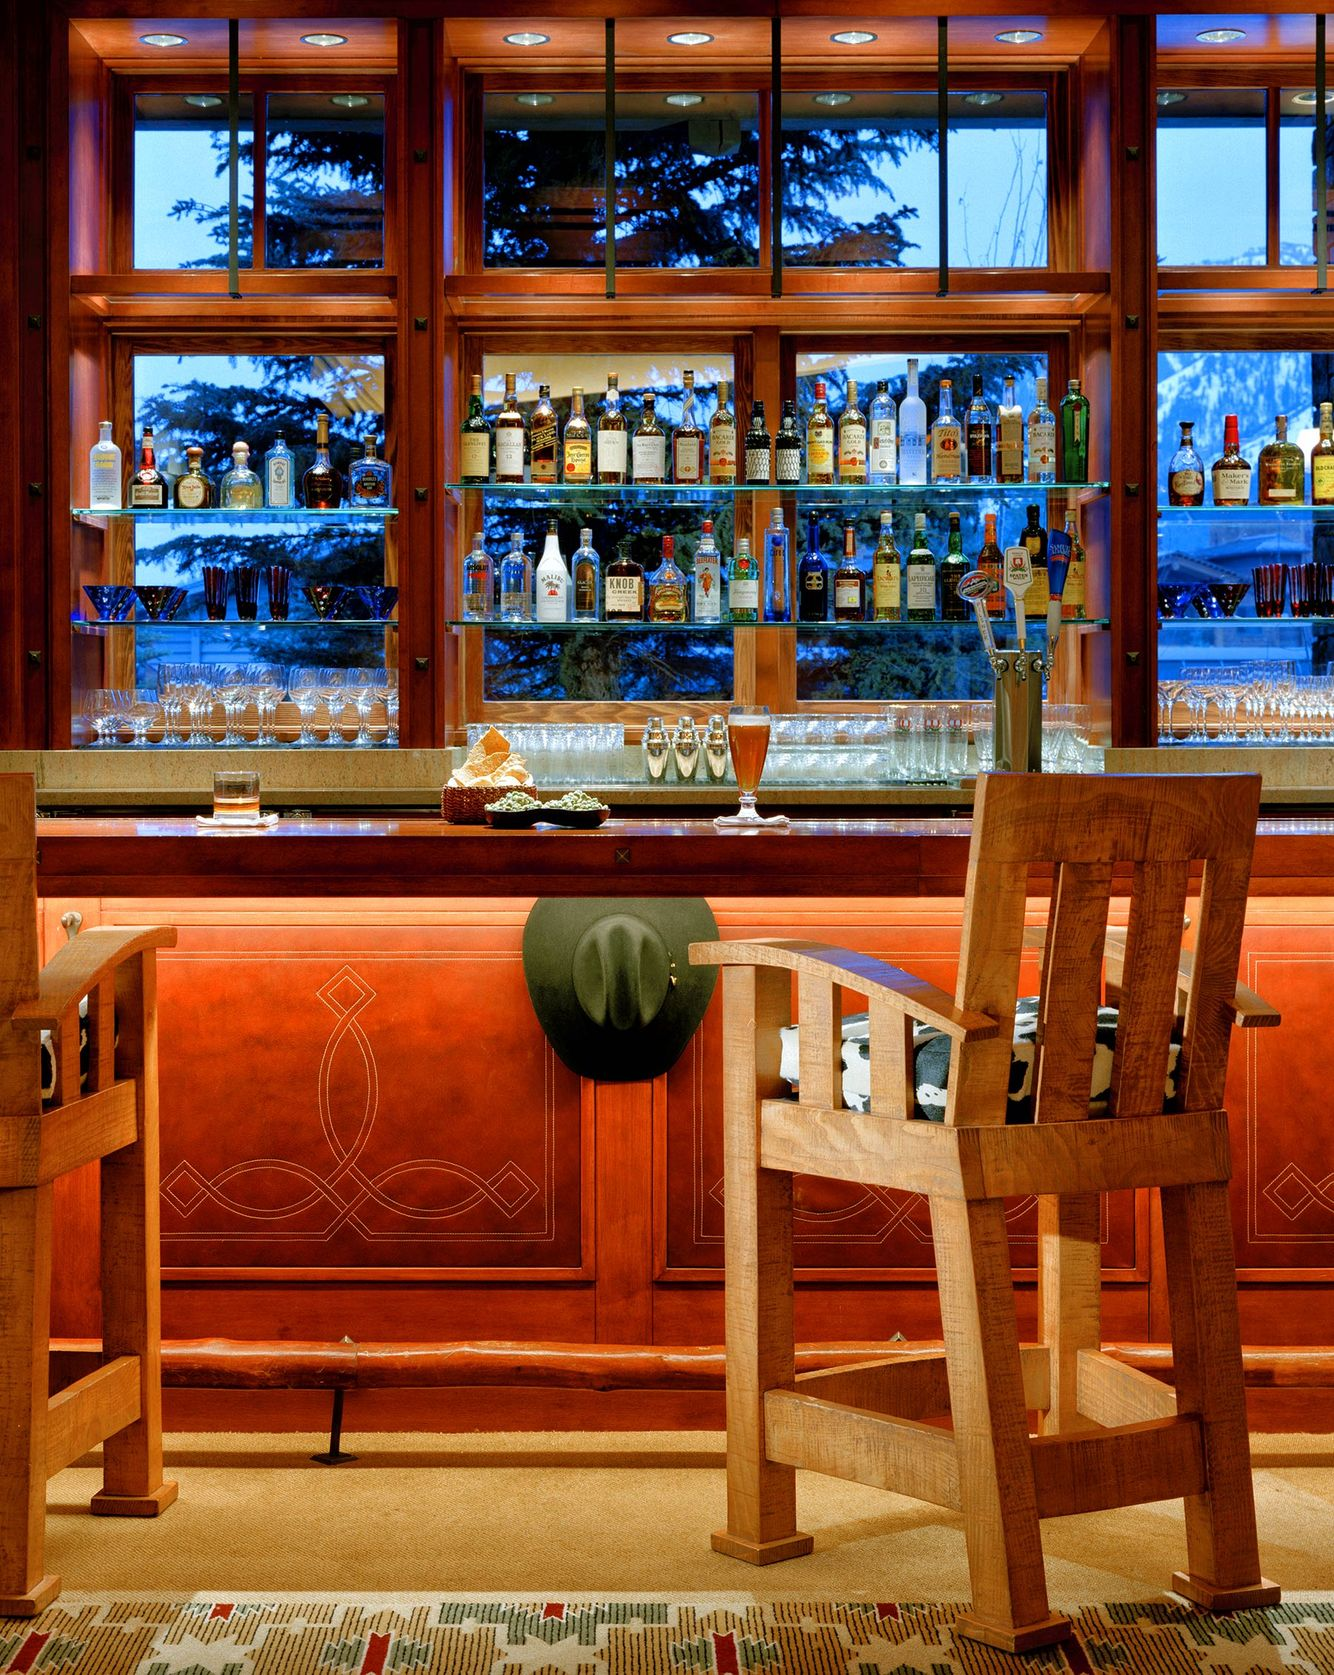 John-Sutton-Photography Four Seasons Resort Bar